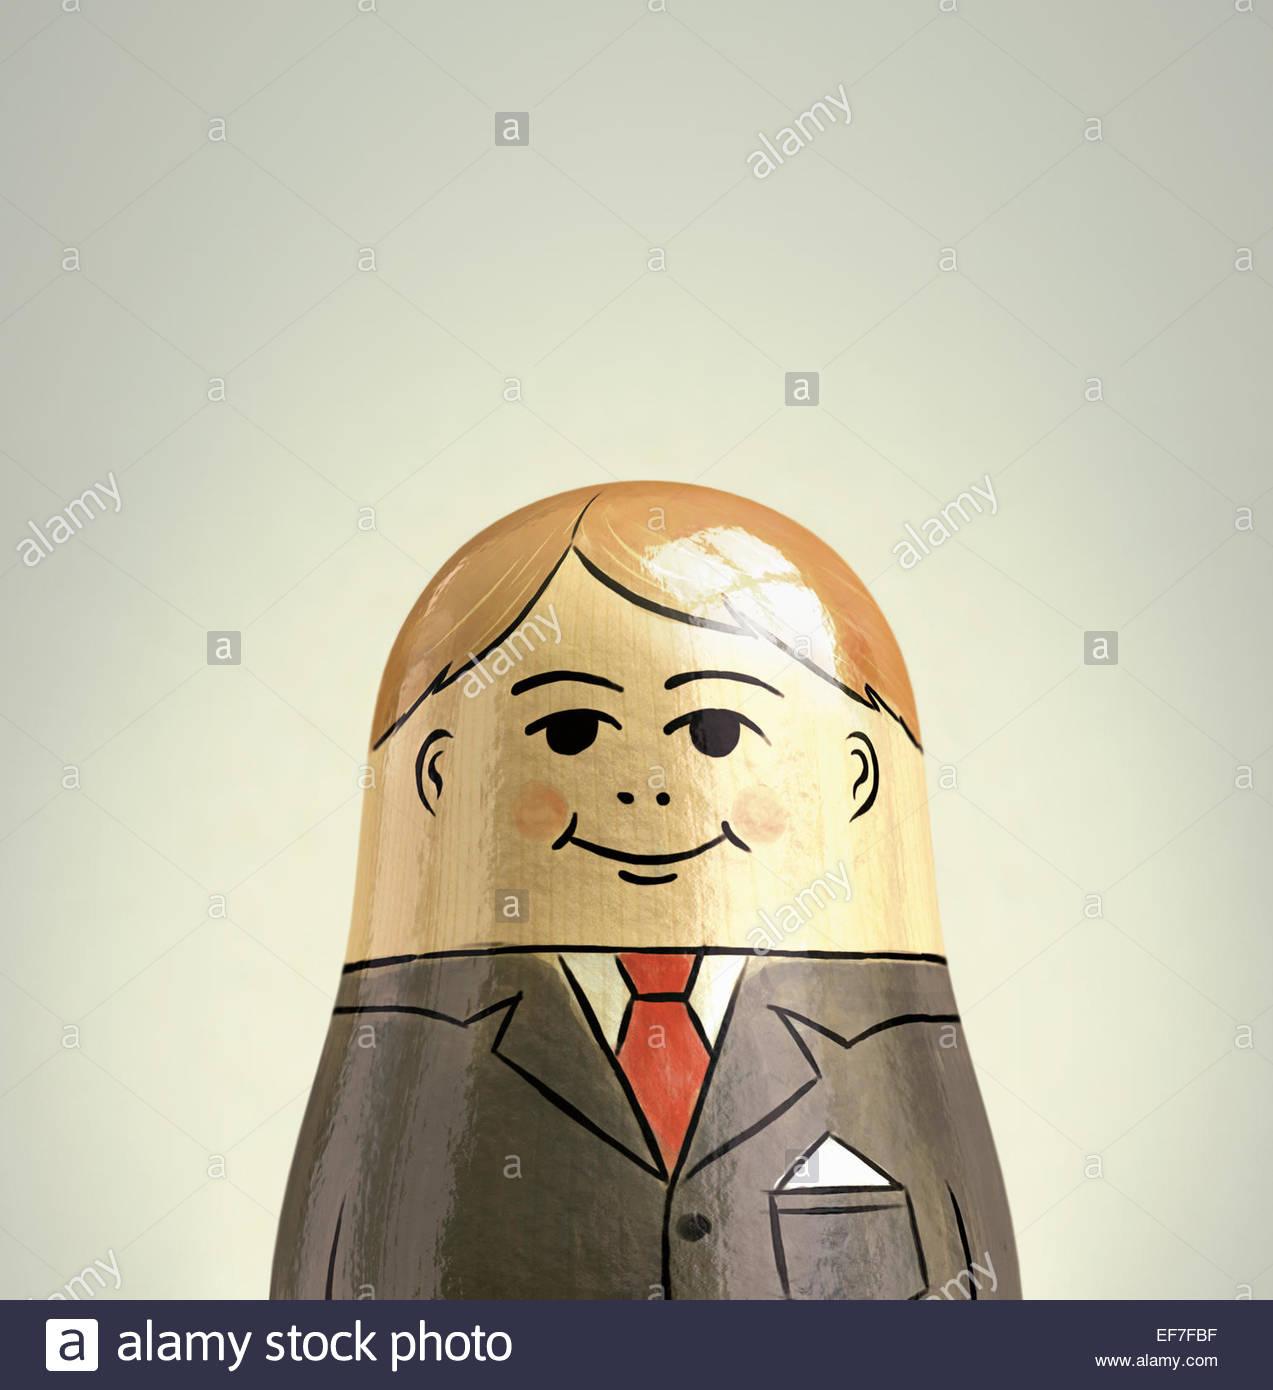 Happy, smiling businessman nesting doll - Stock Image